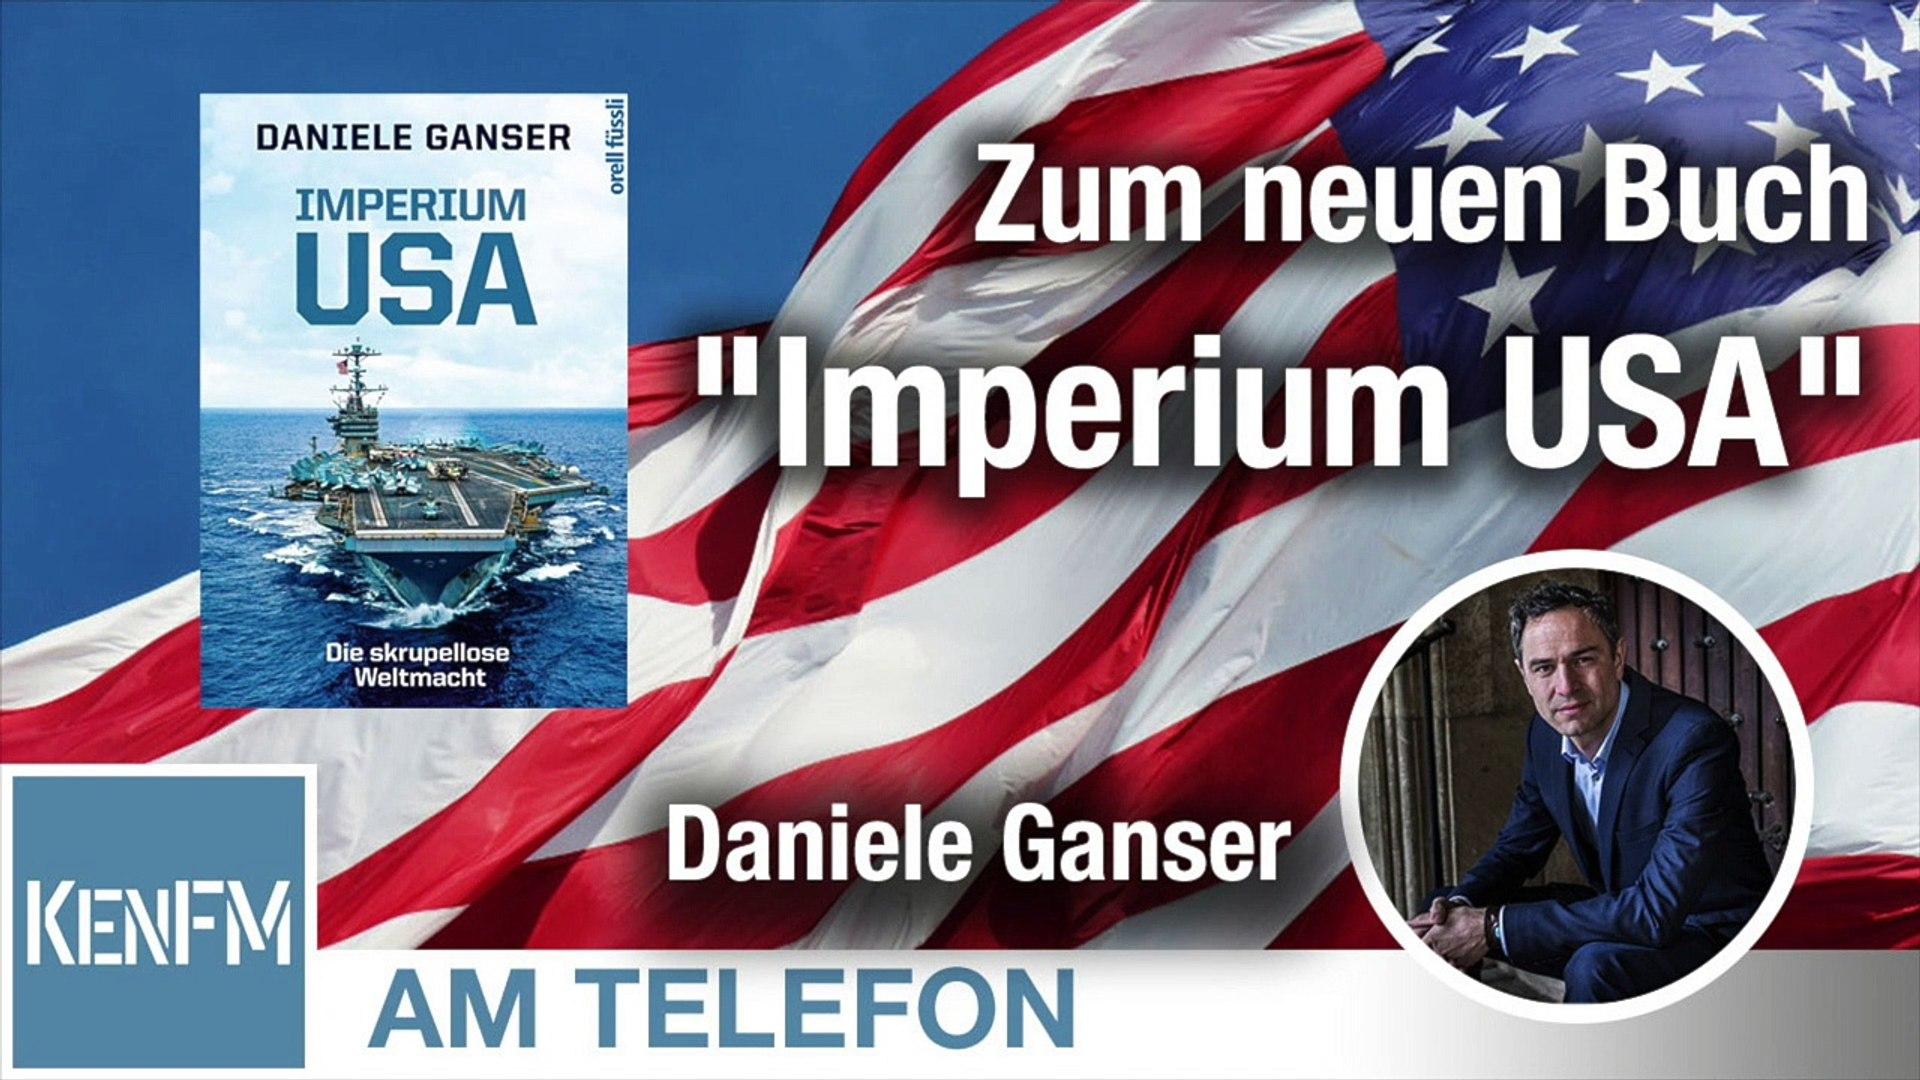 "Am Telefon zum neuen Buch ""Imperium USA"": Dr. Daniele Ganser"